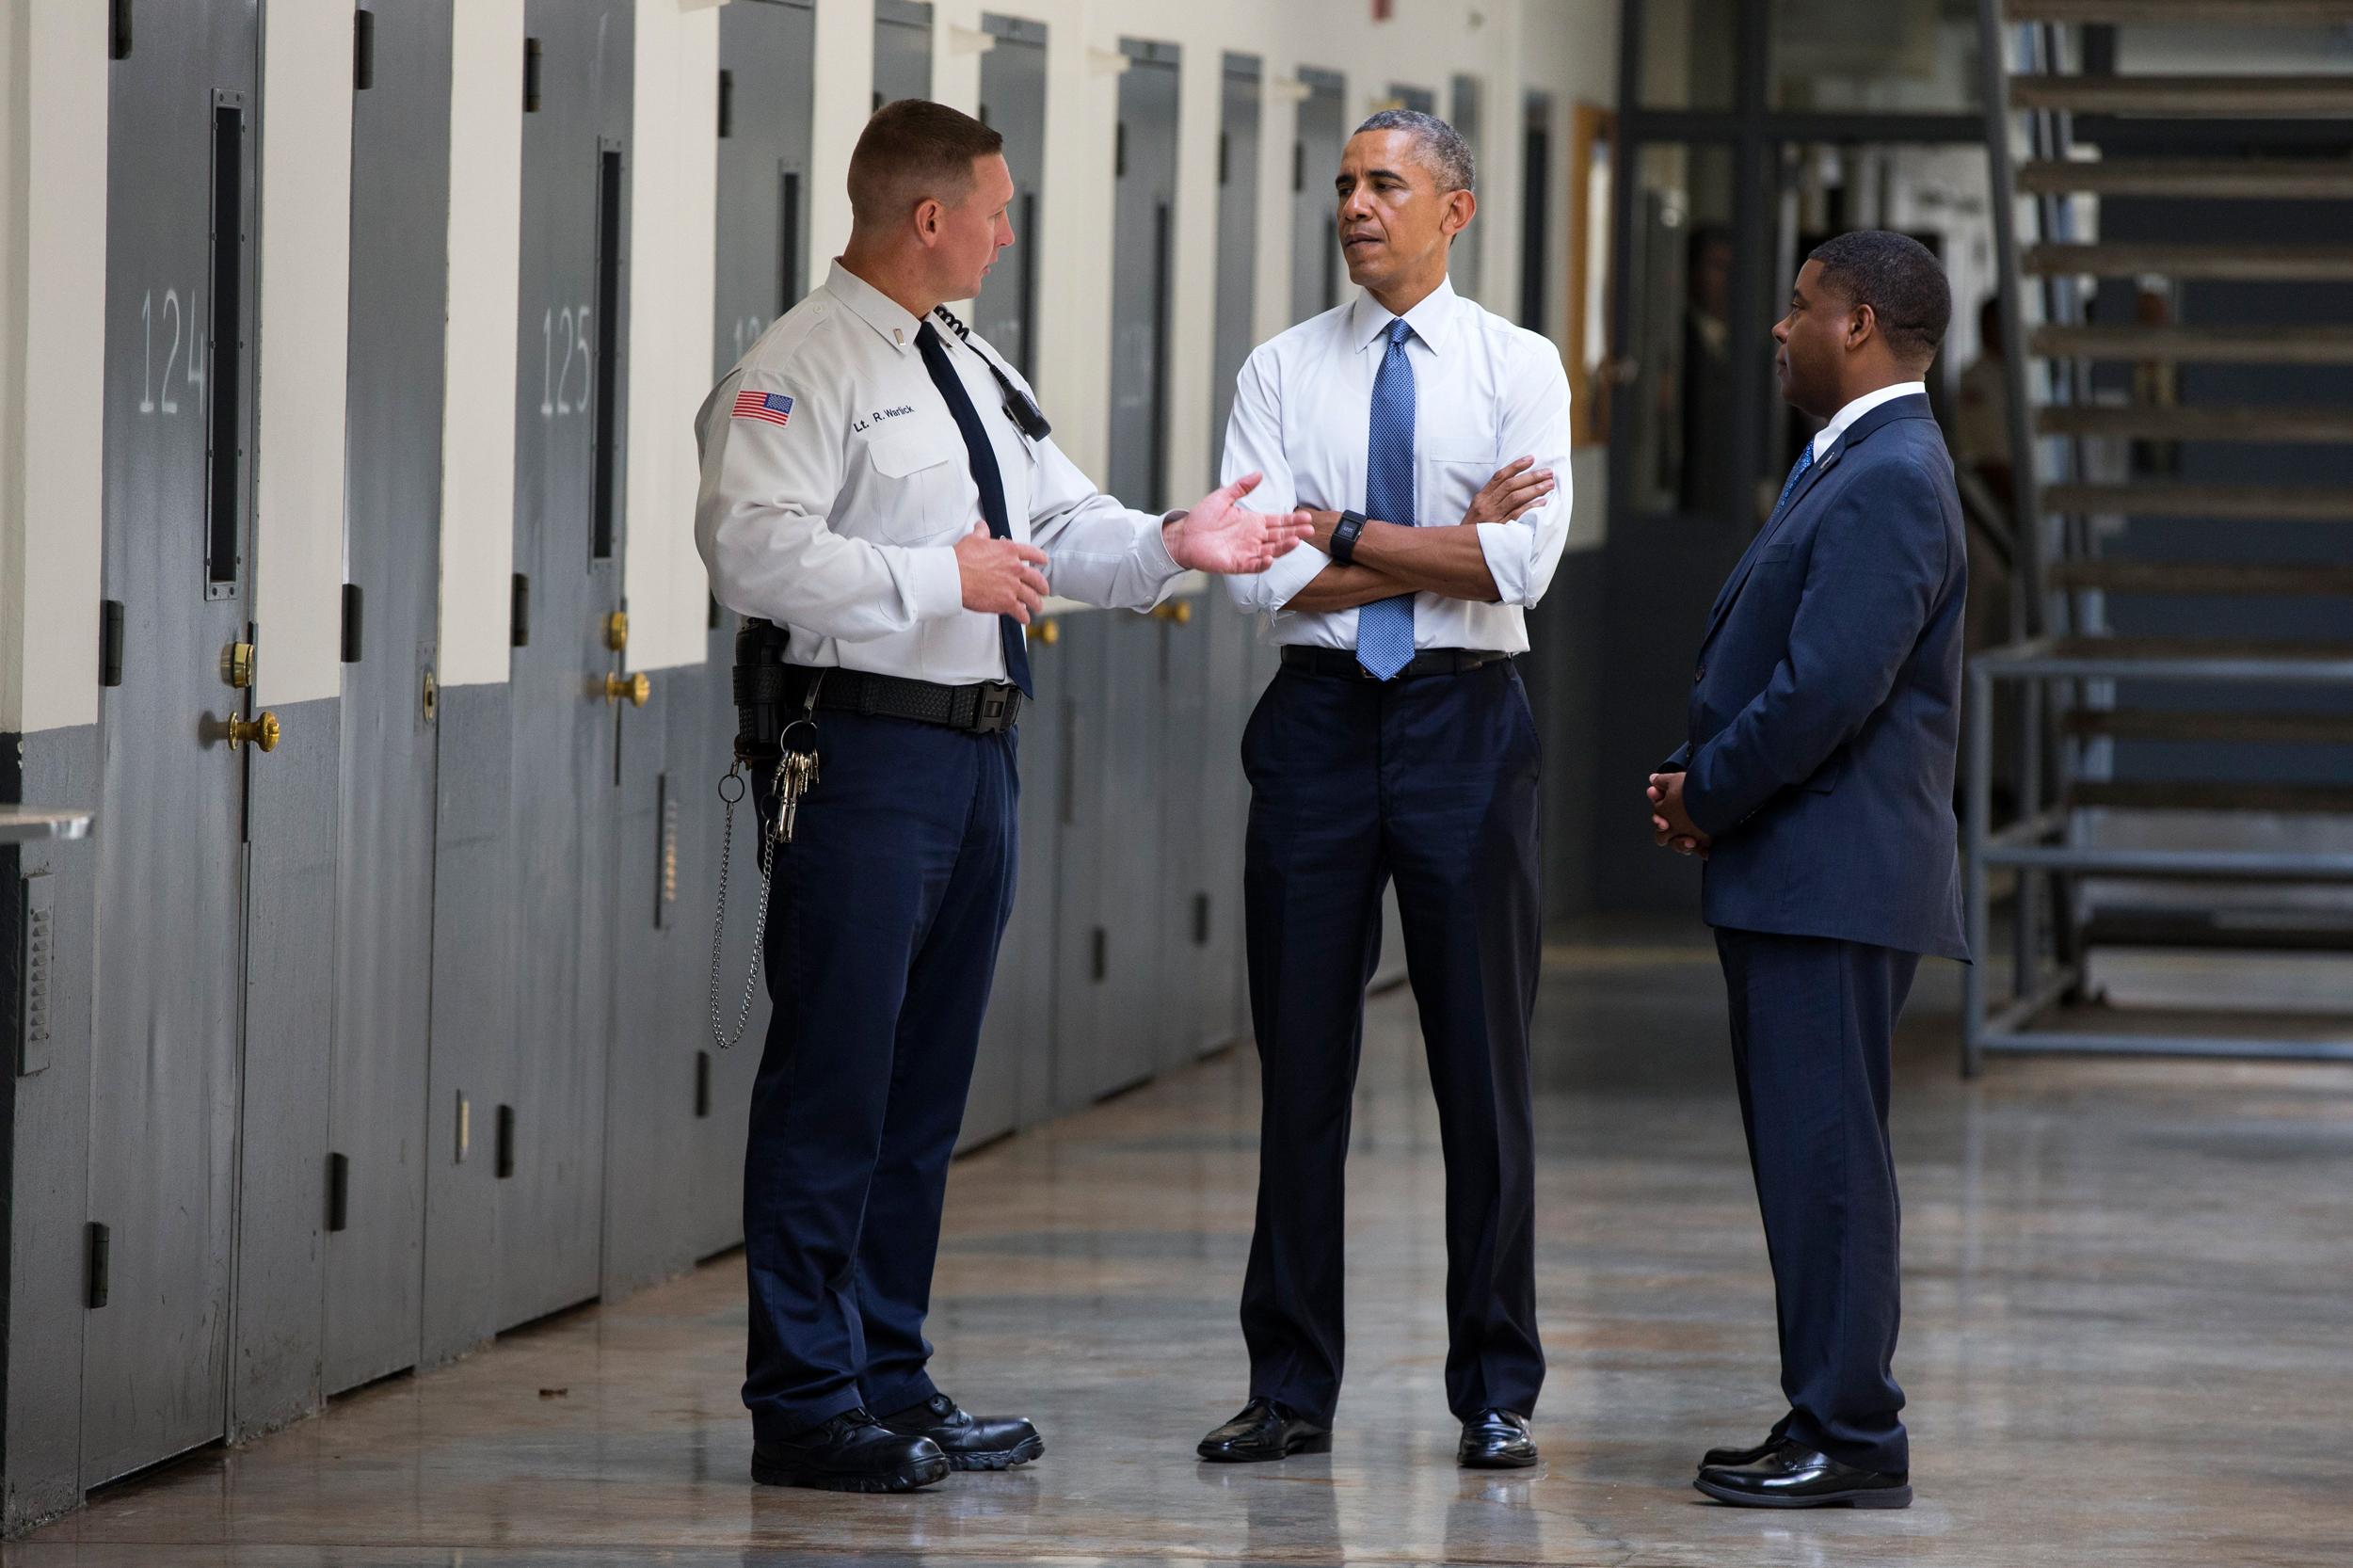 Obama Visits Prison in Push for Reform